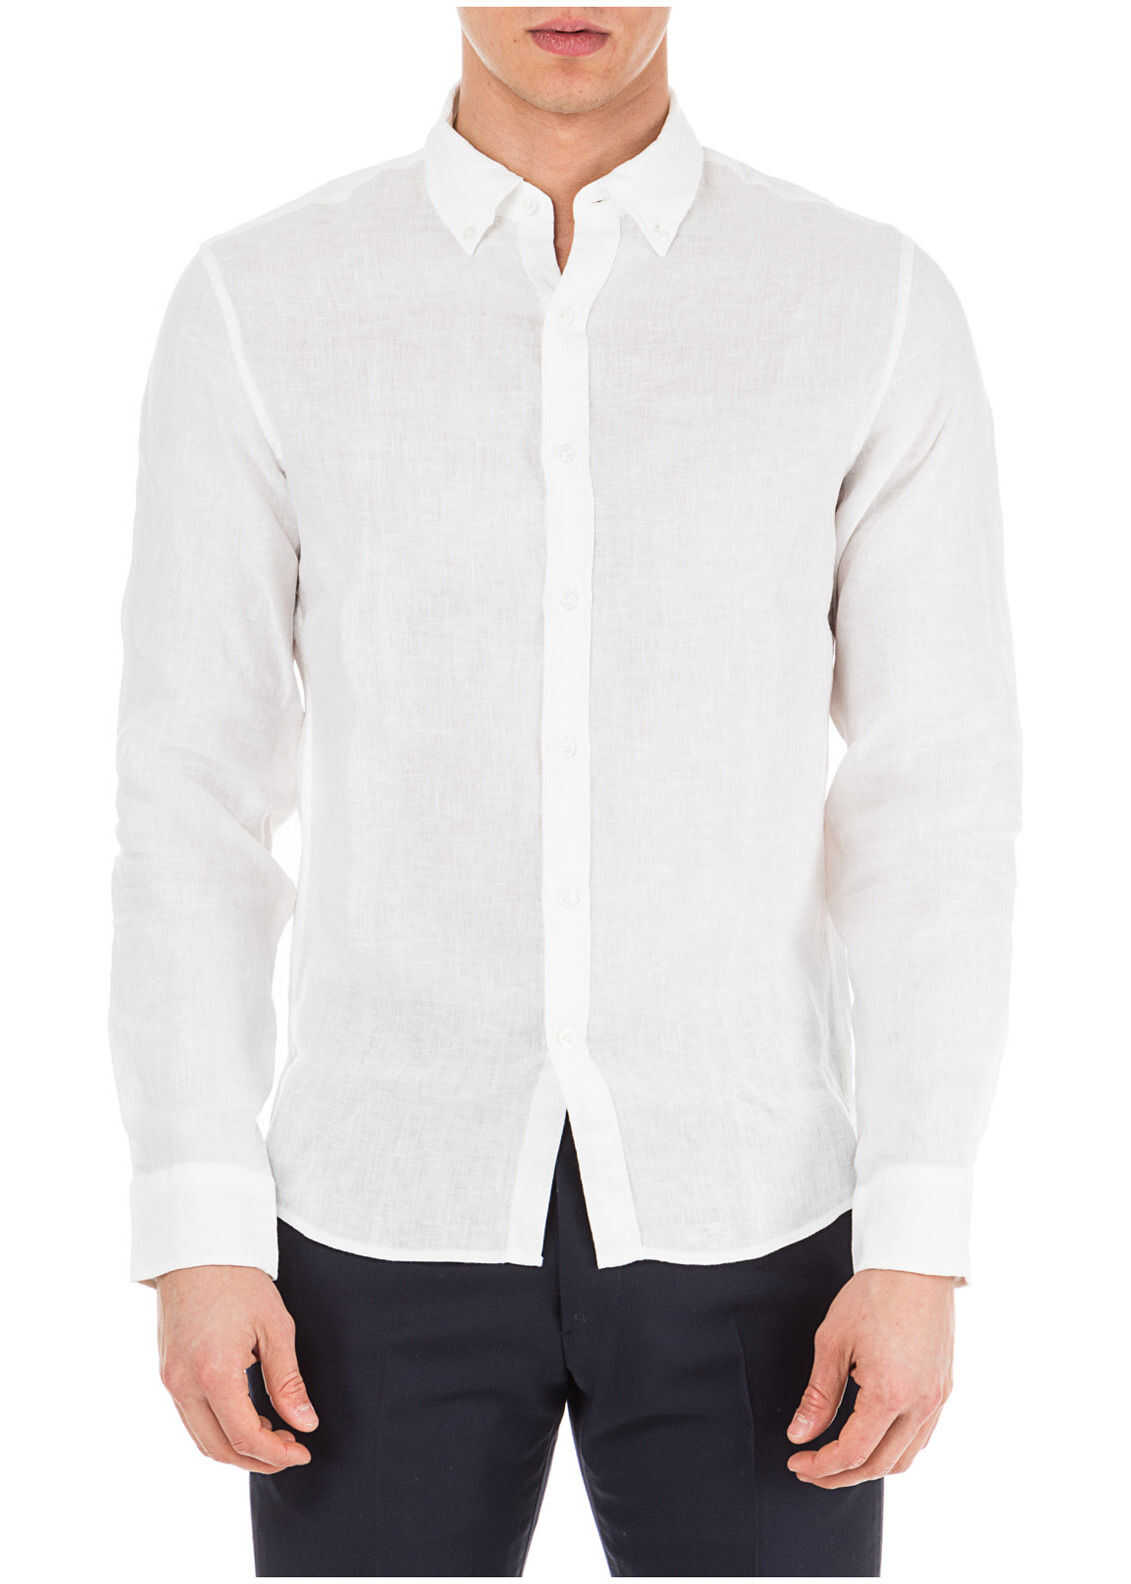 Michael Kors Dress Shirt White